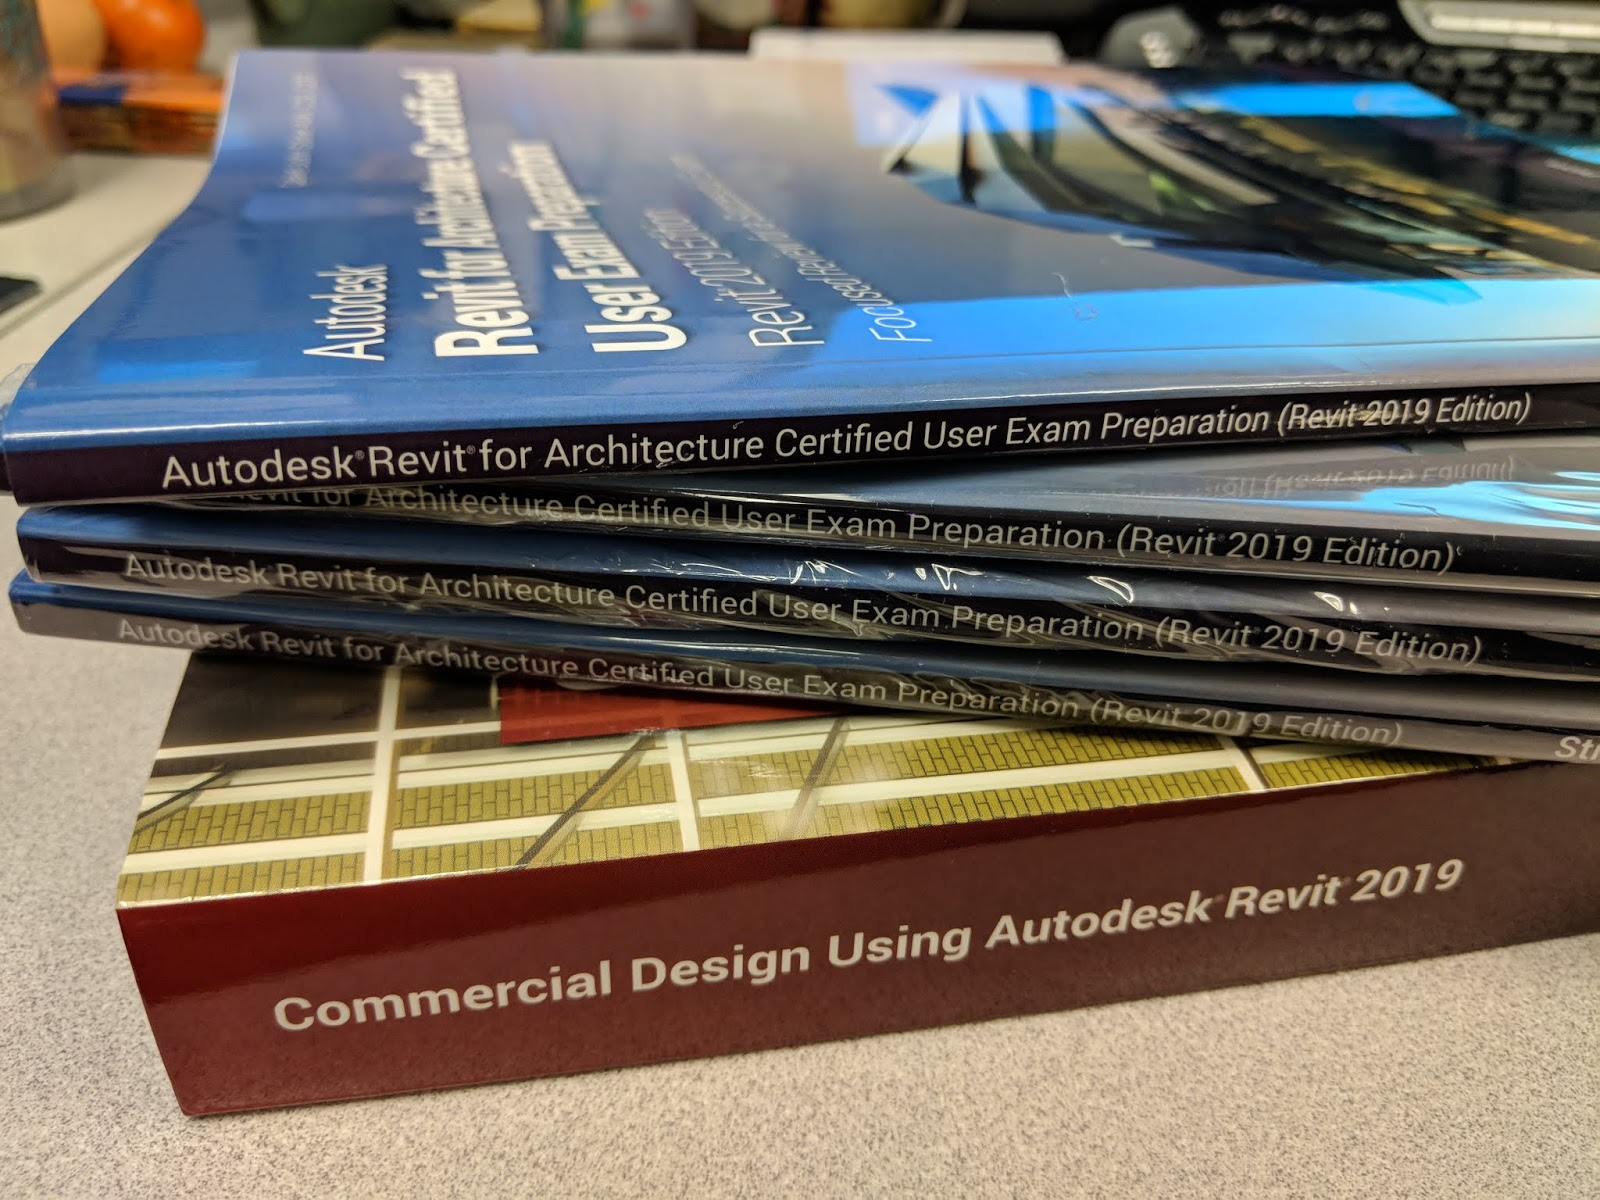 BIM Chapters: New Book: Autodesk Revit for Architecture